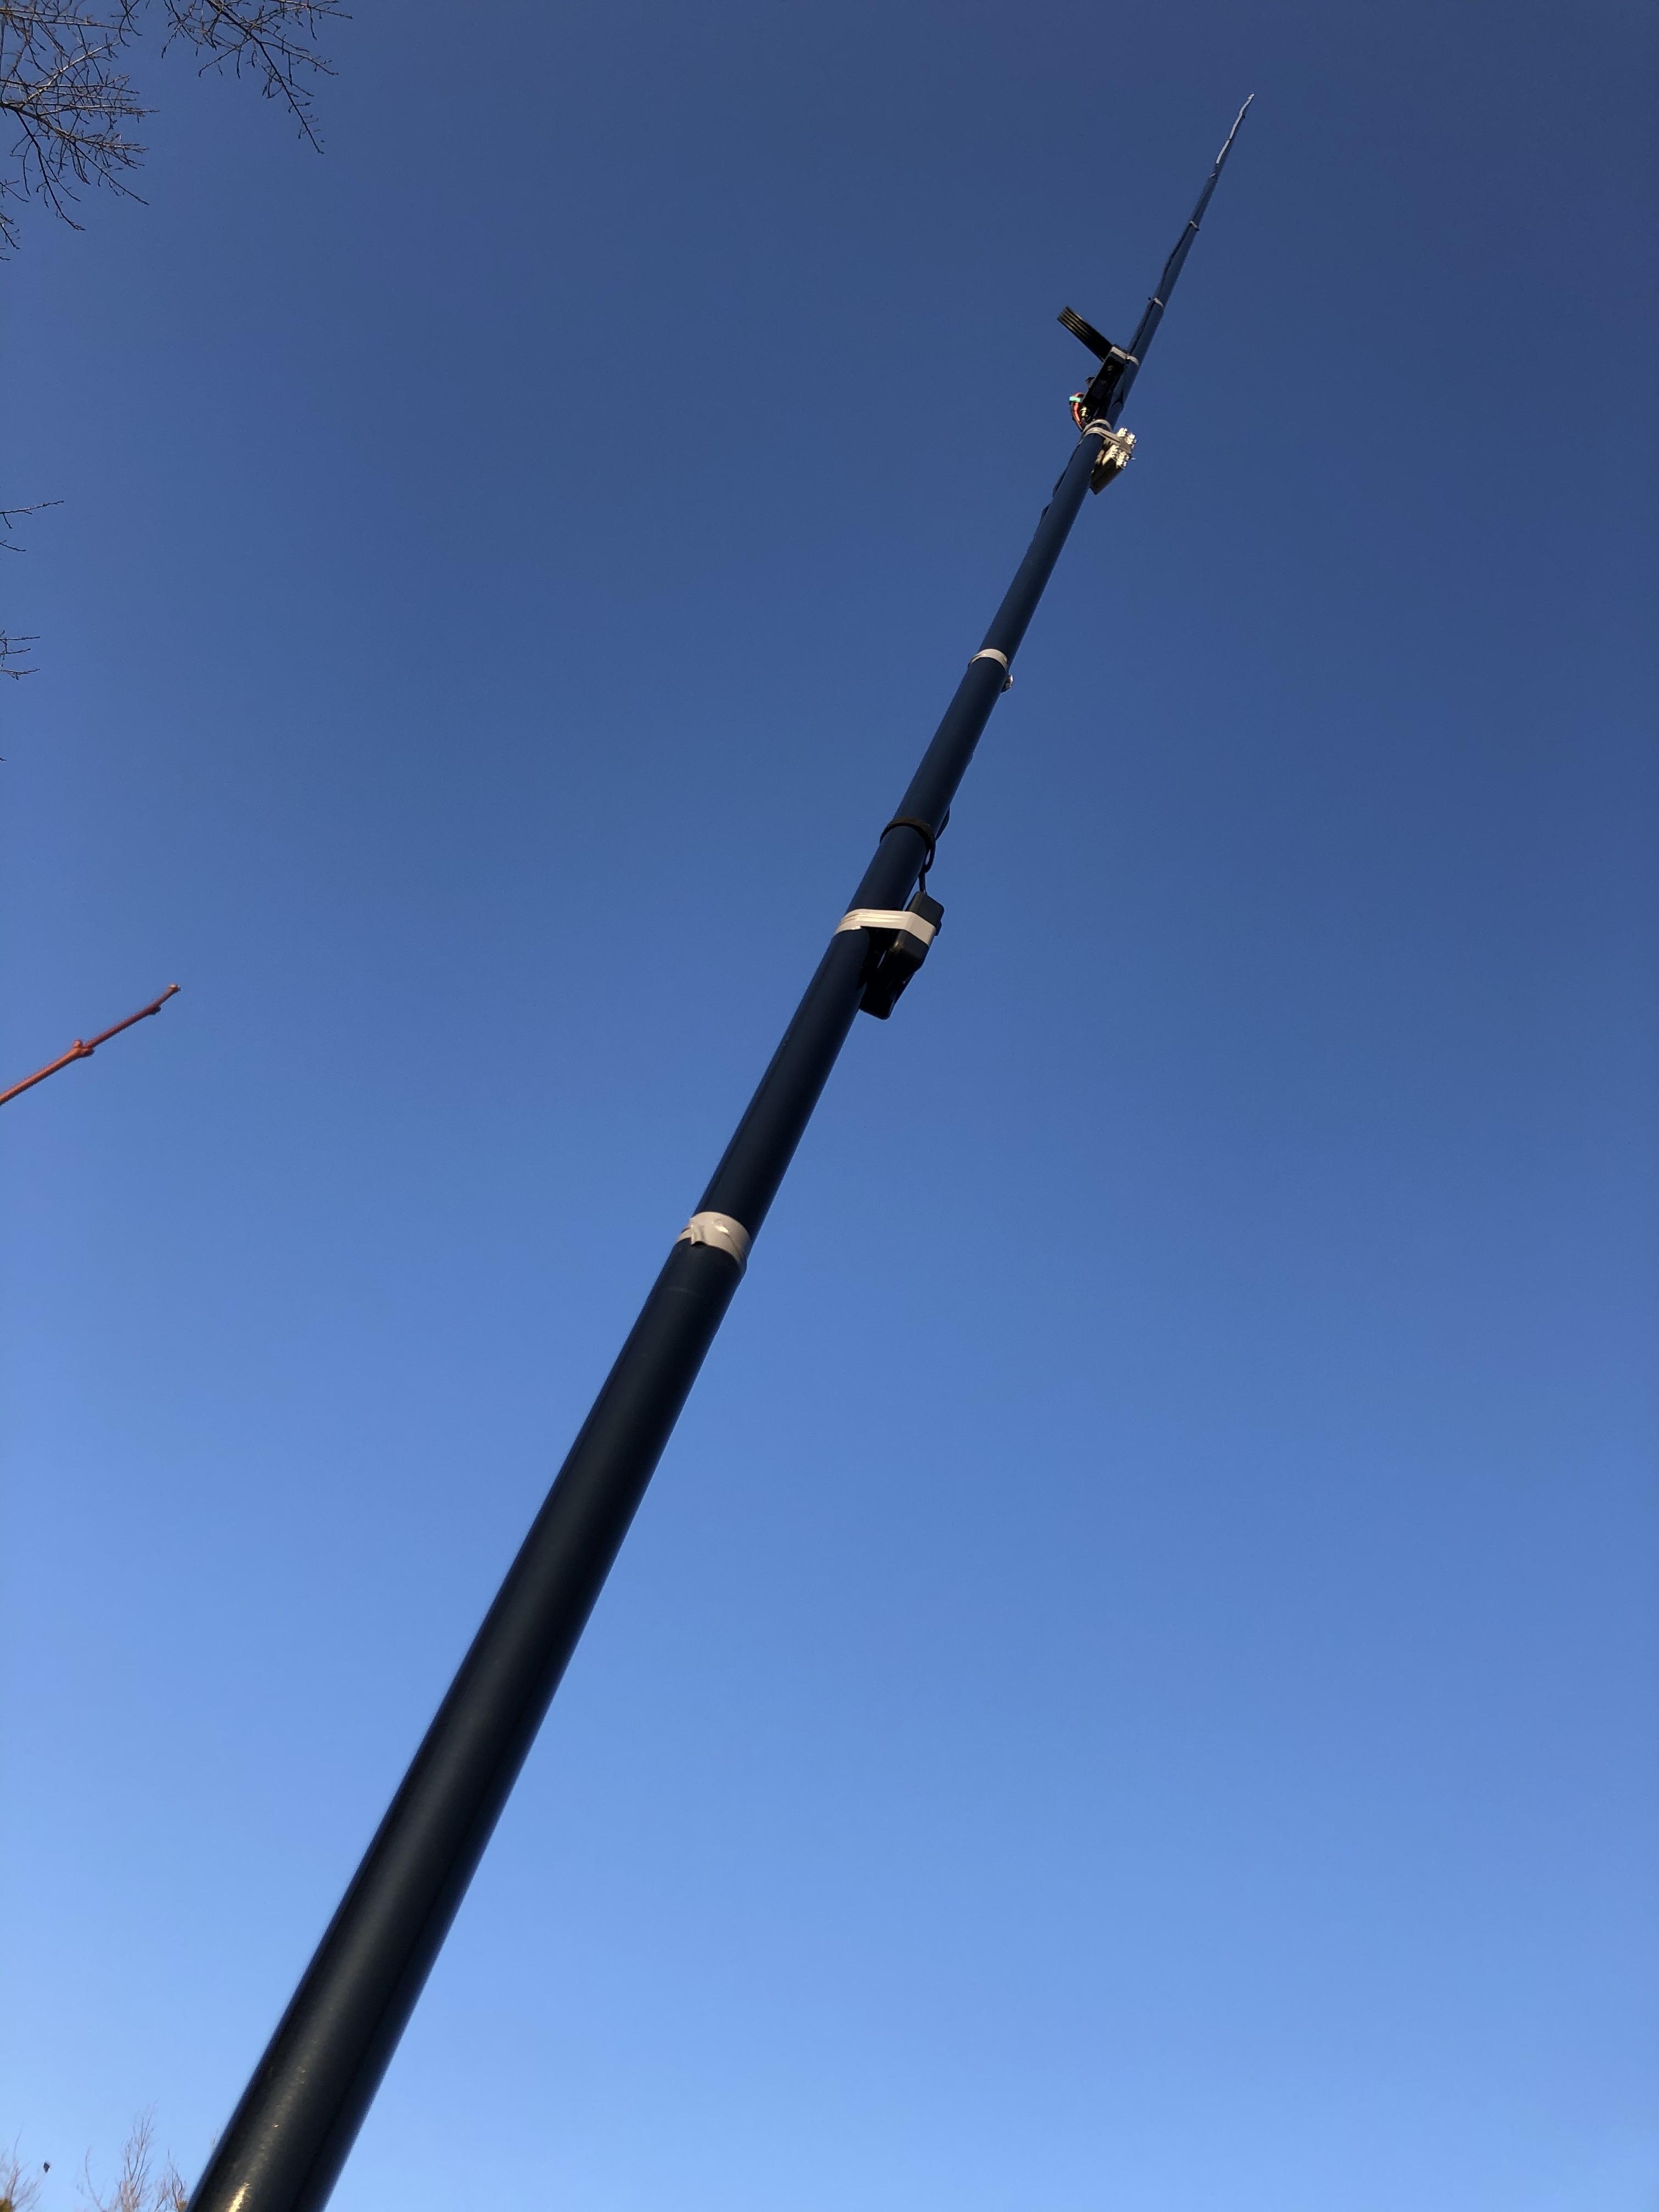 Mein aktuelles Projekt: Antenne in 150m Höhe (am Siemens